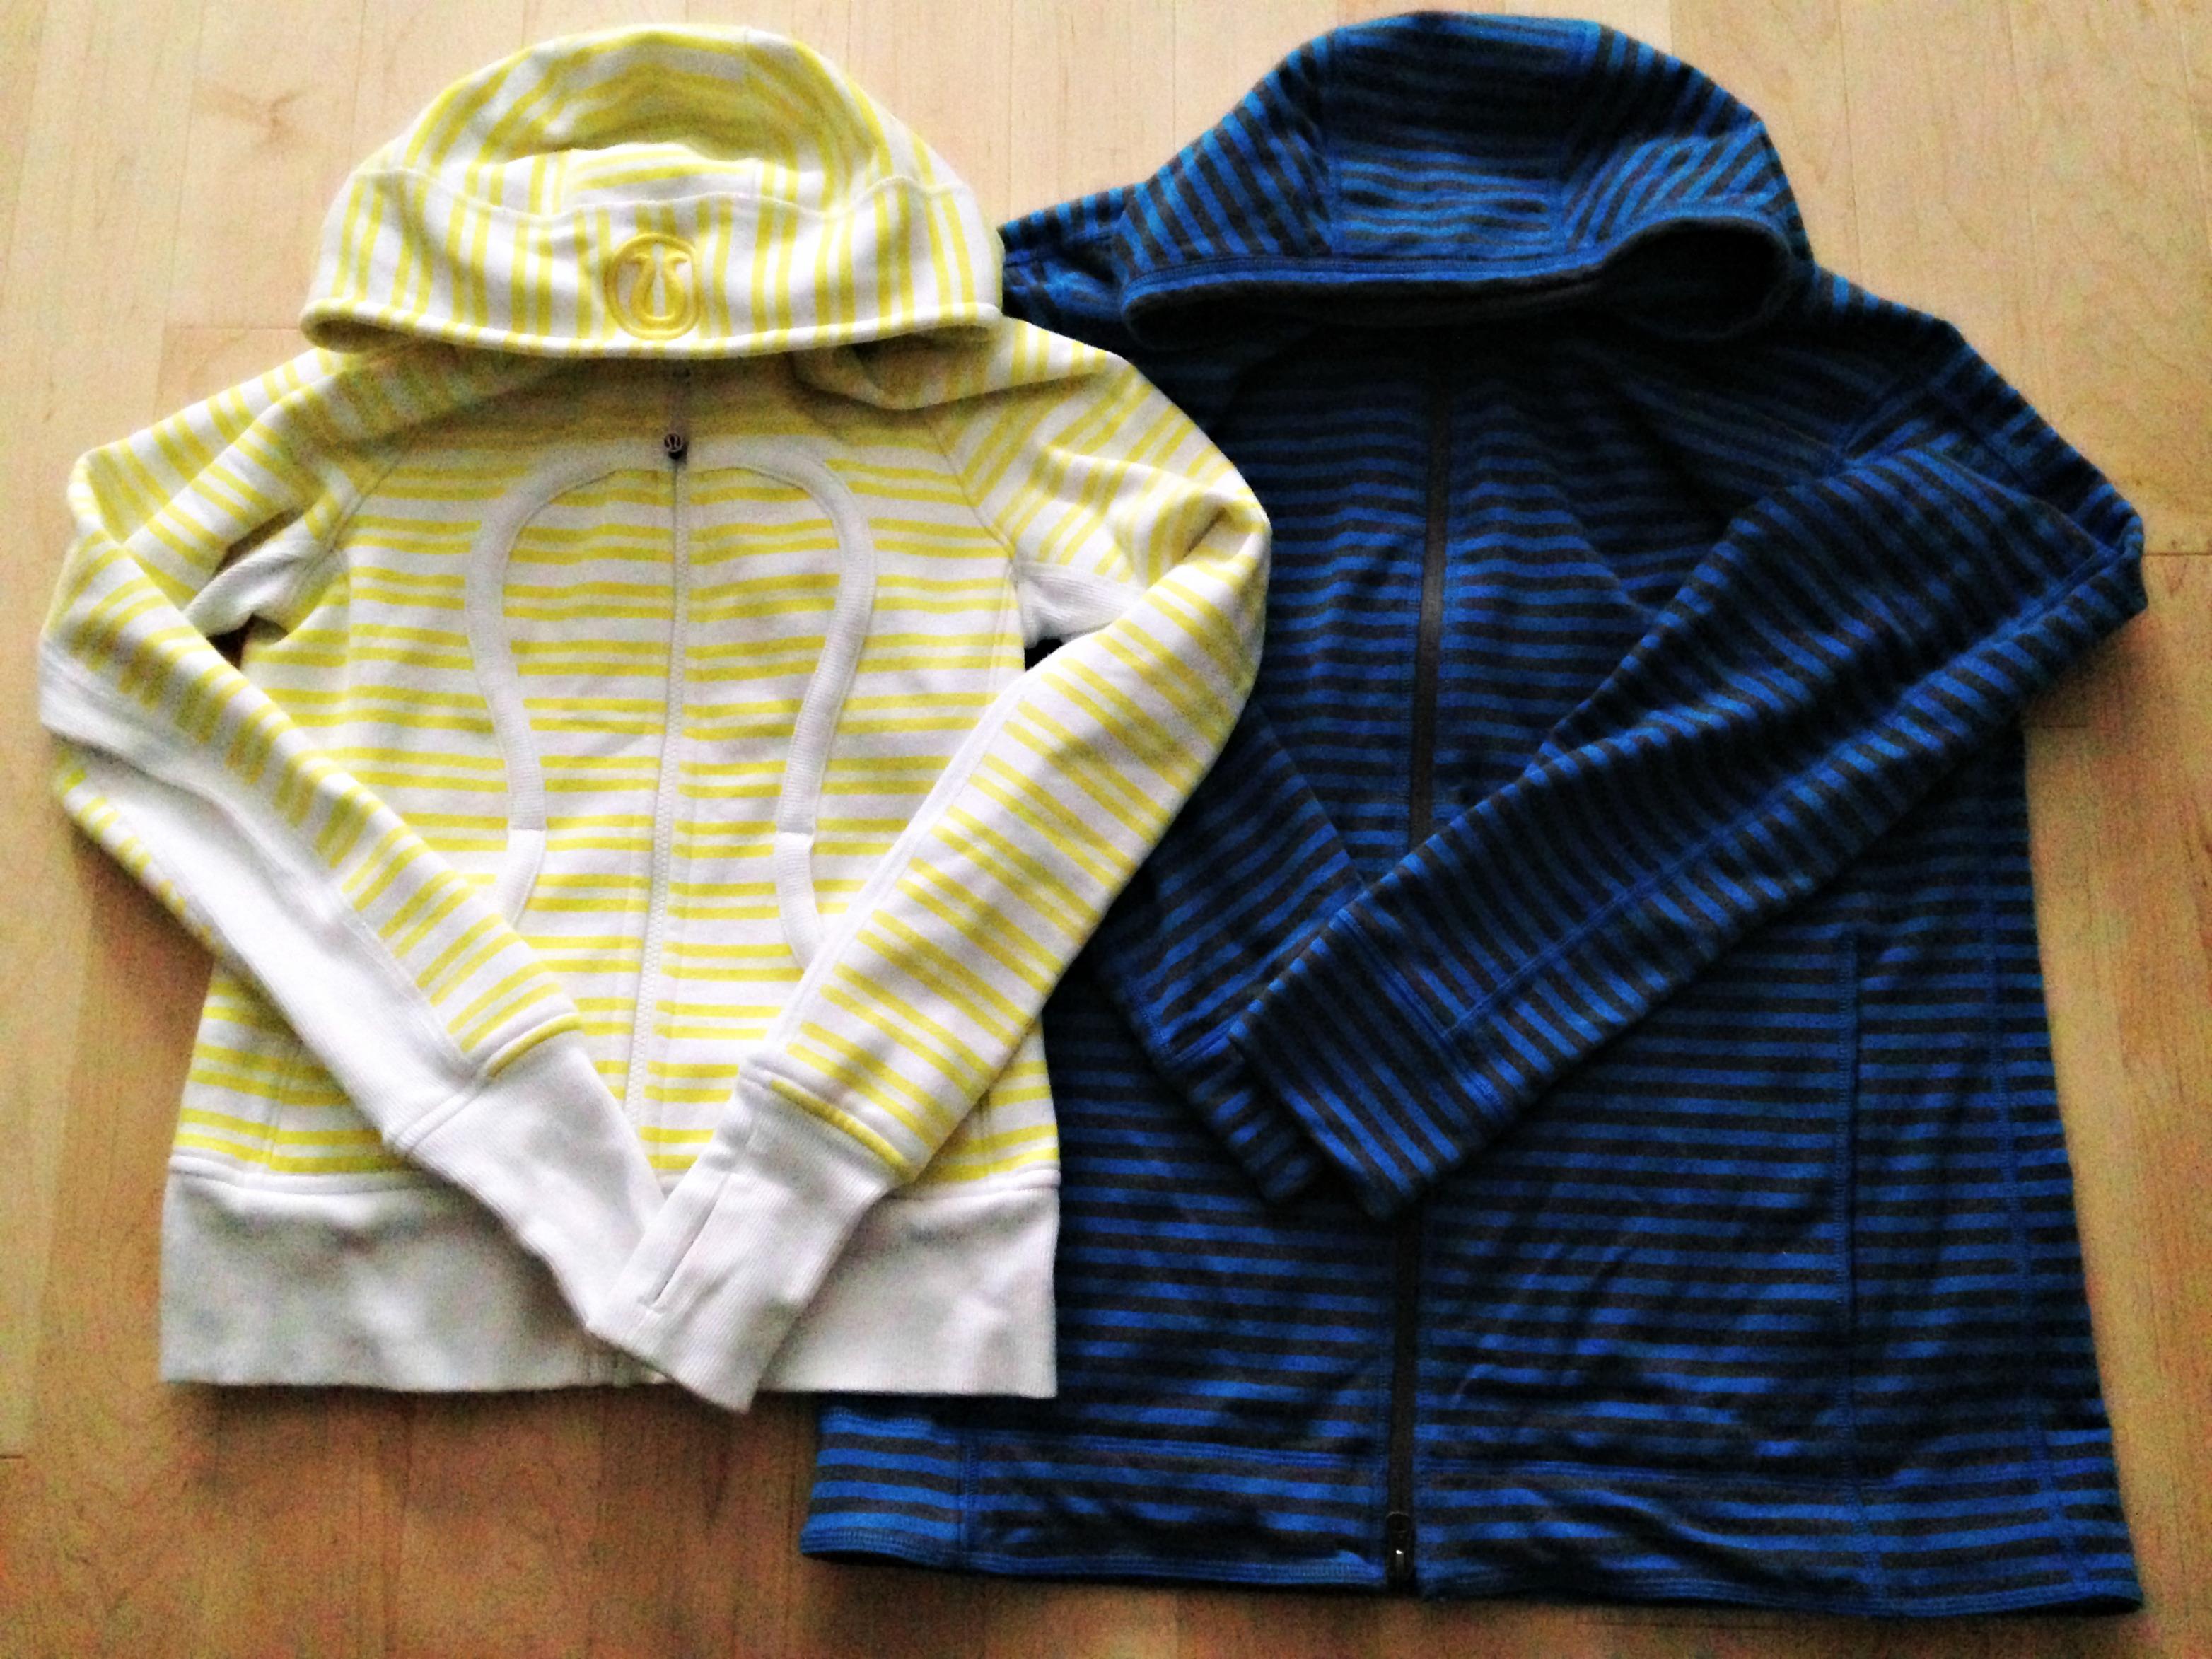 Friday Favorites: The very best sweatshirts